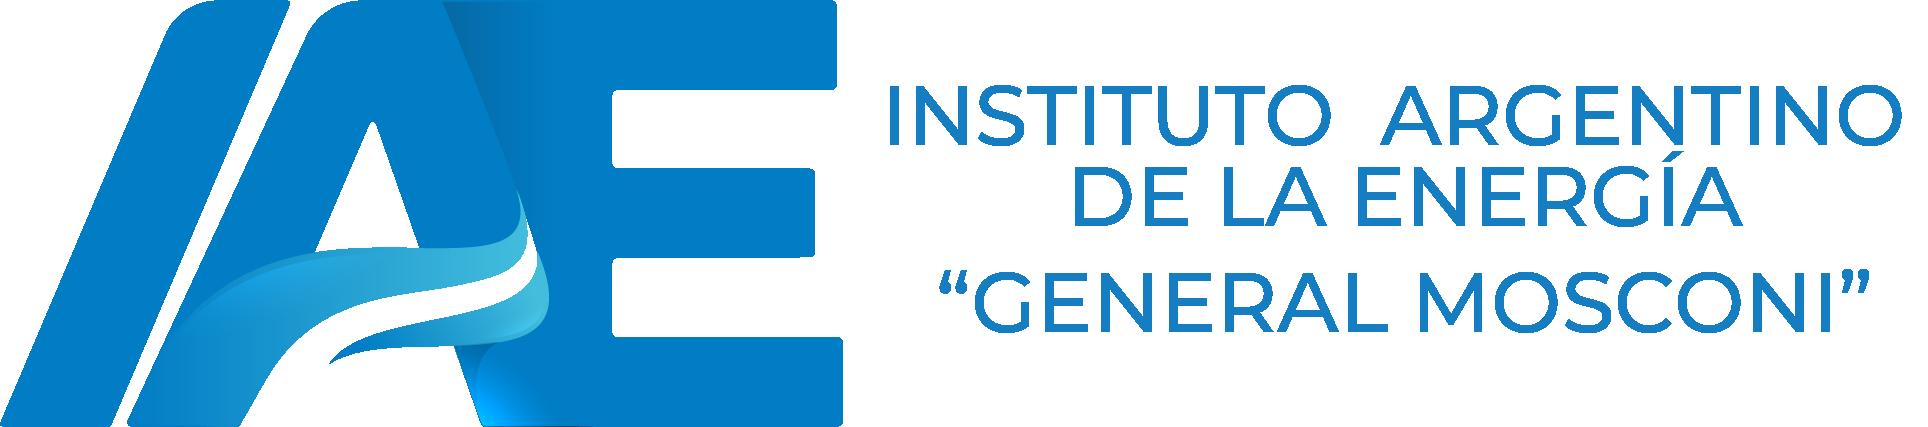 IAE Instituto Argentino de la Energía «General Mosconi»